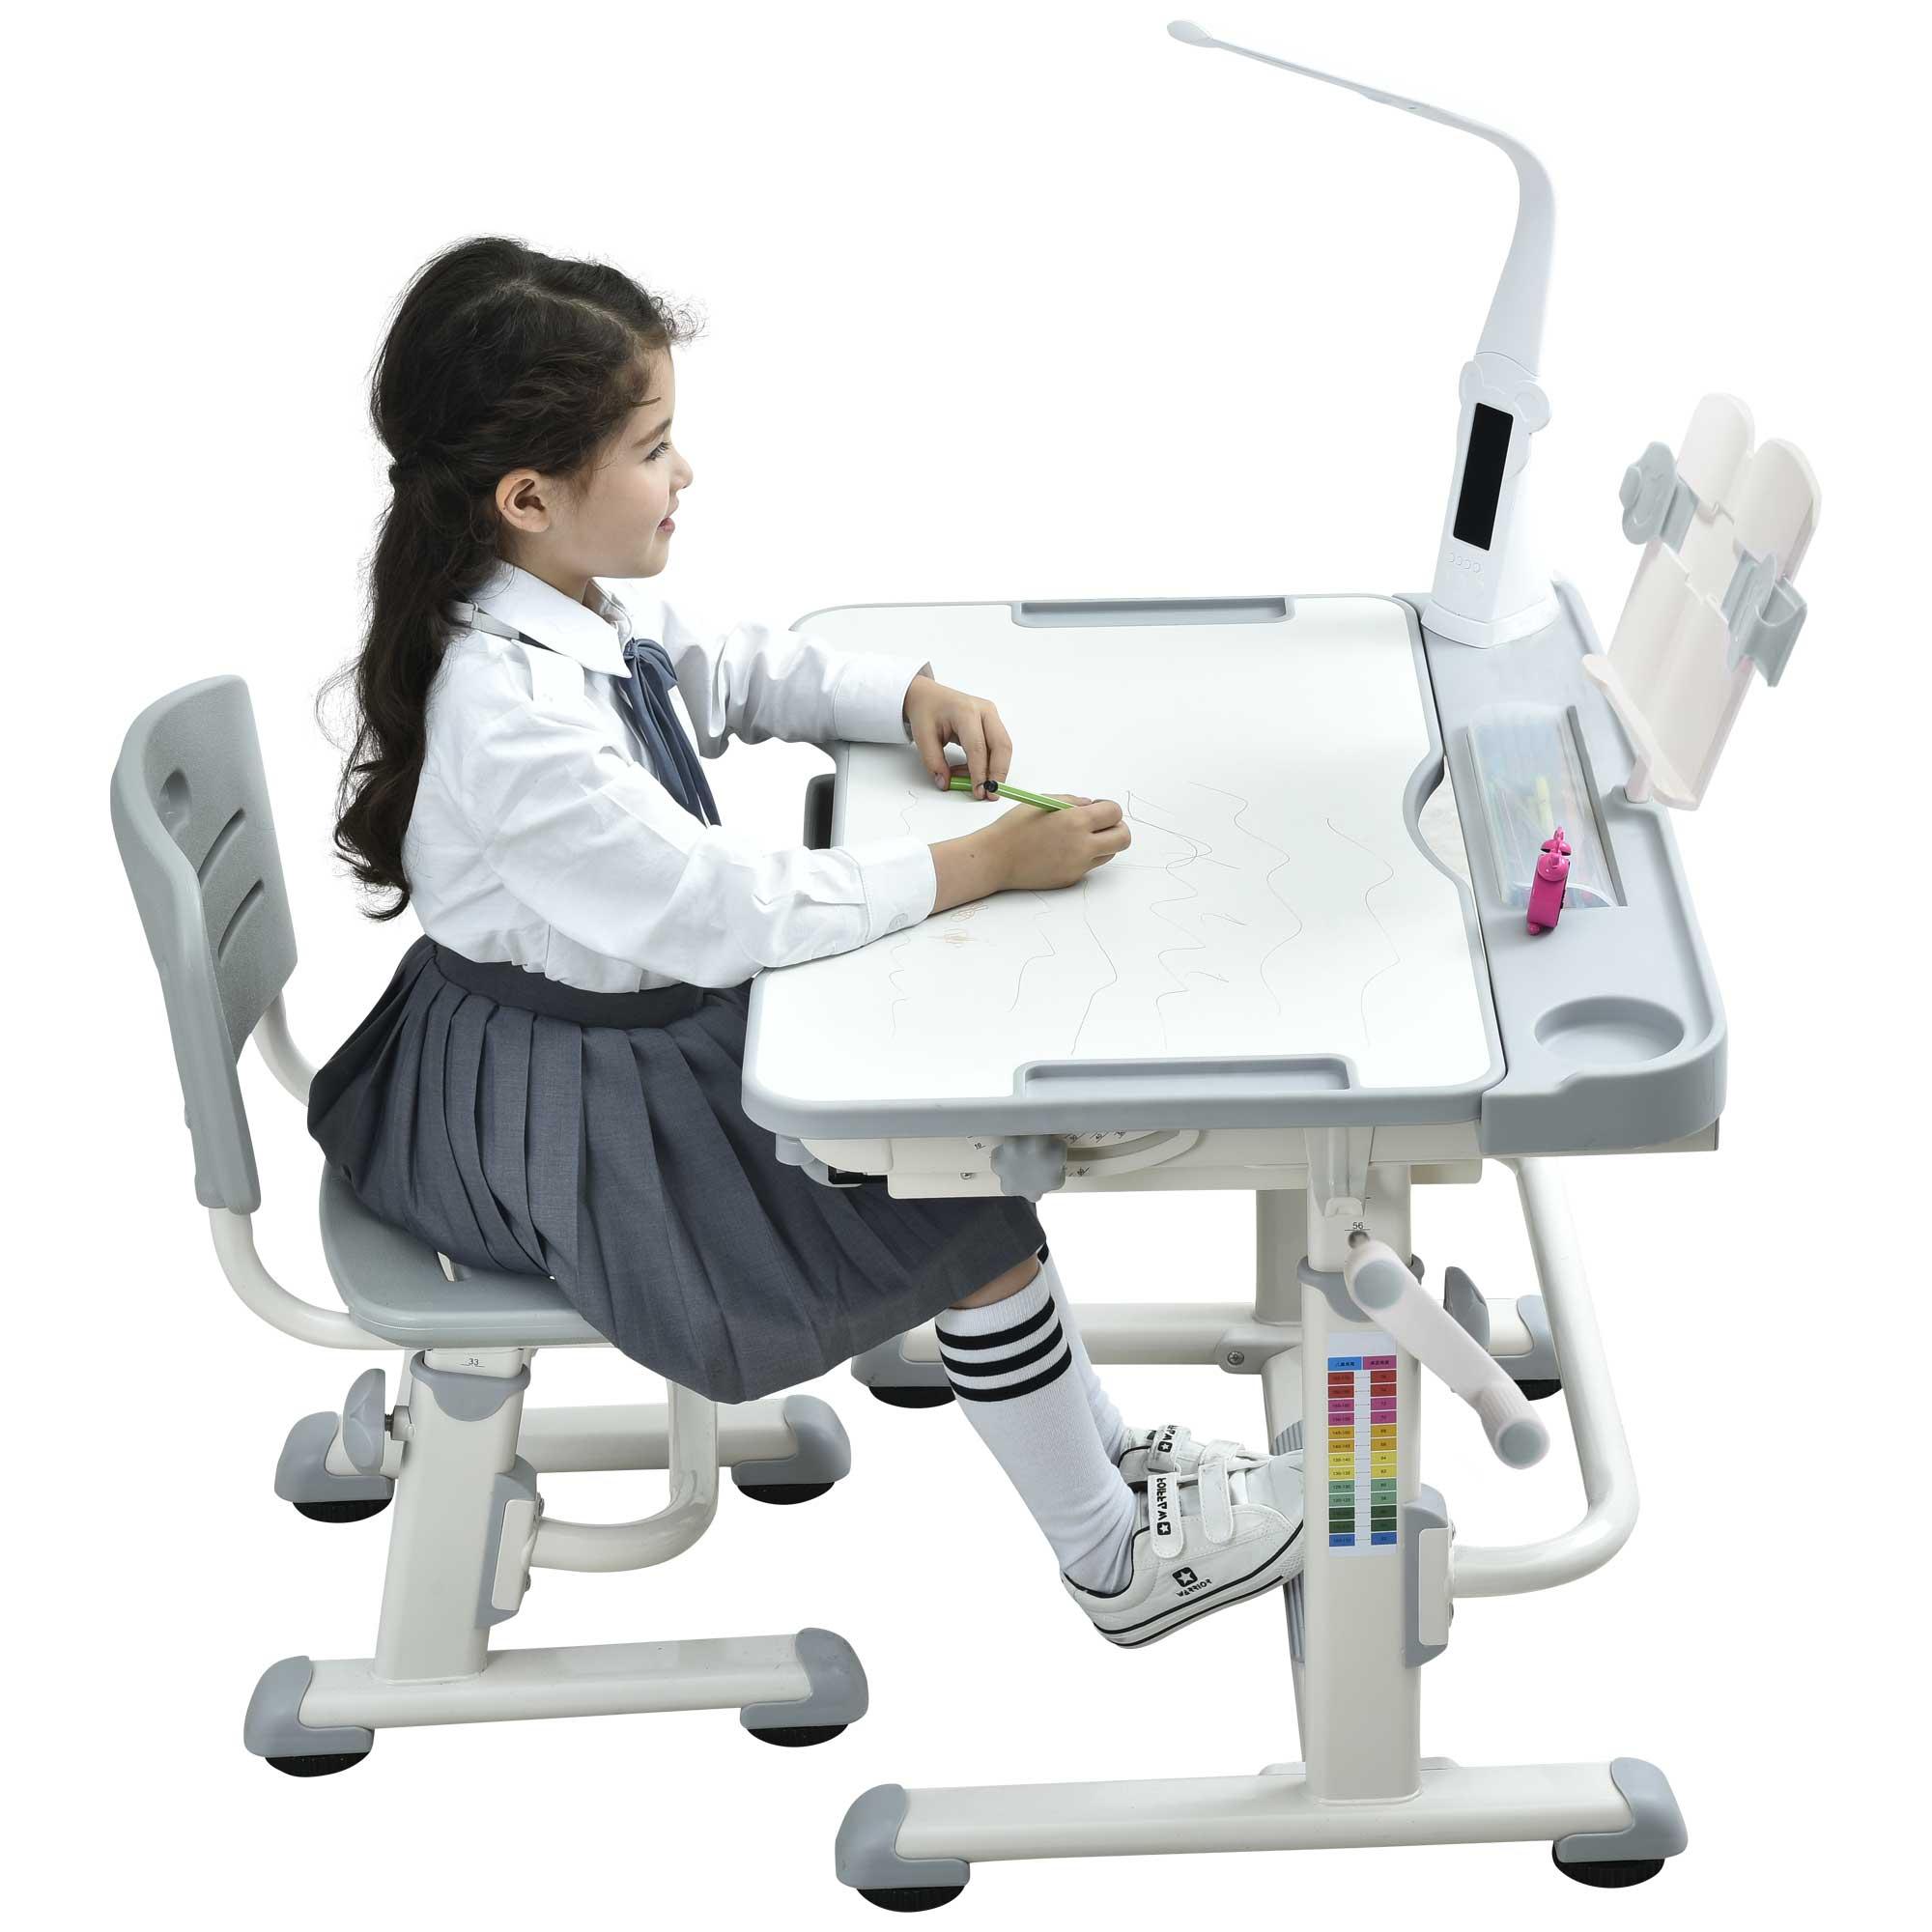 kids-desk-chair-school-desk-grey-table-for-kids-02